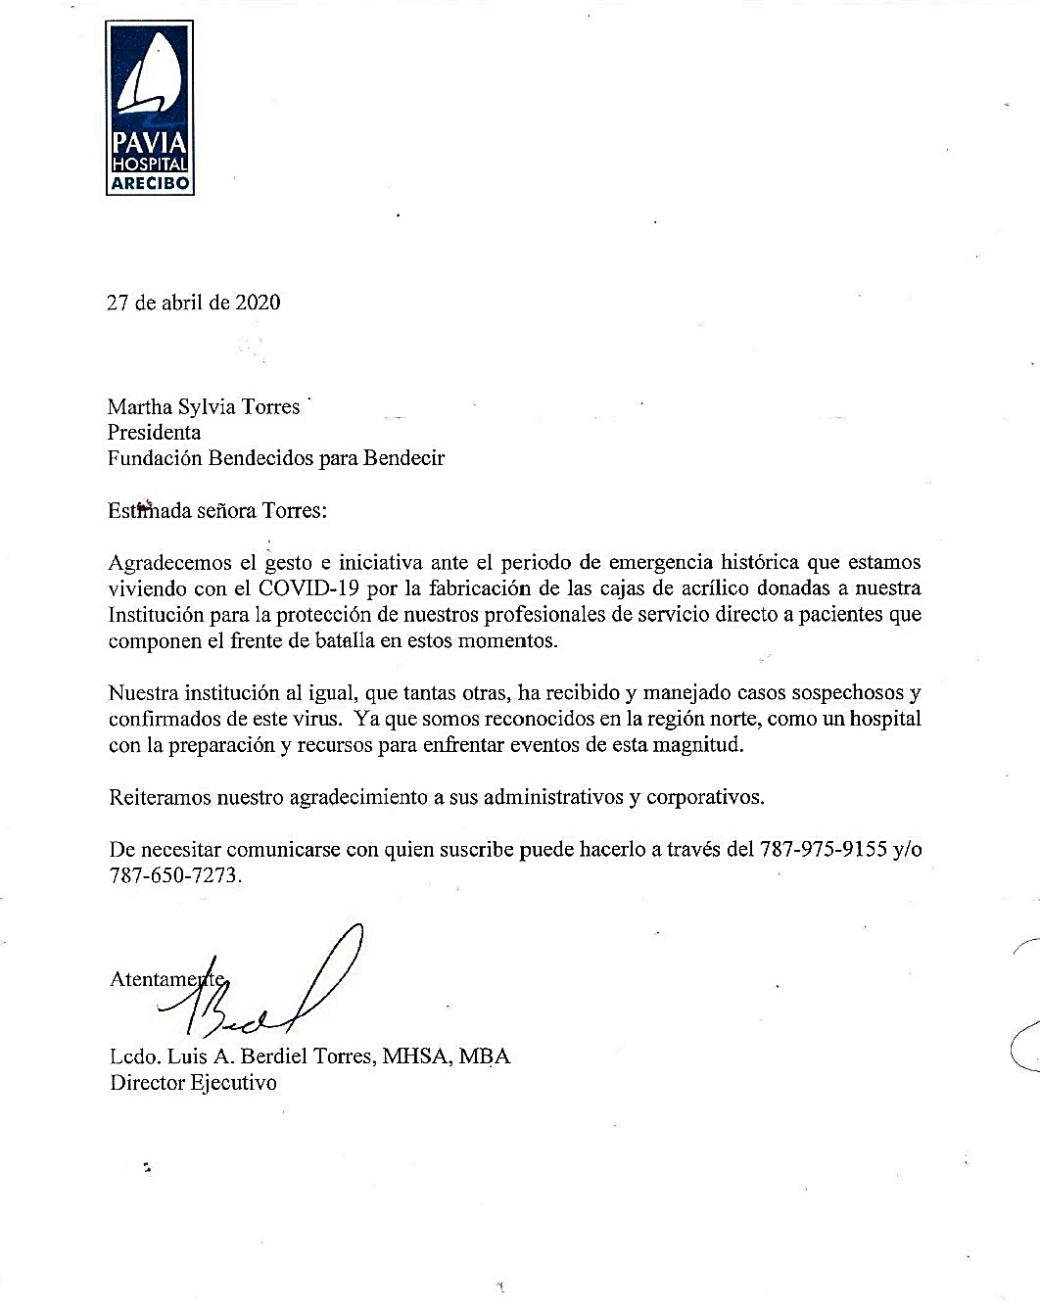 Carta-Agradecimiento-Hospital-Pavia-2020